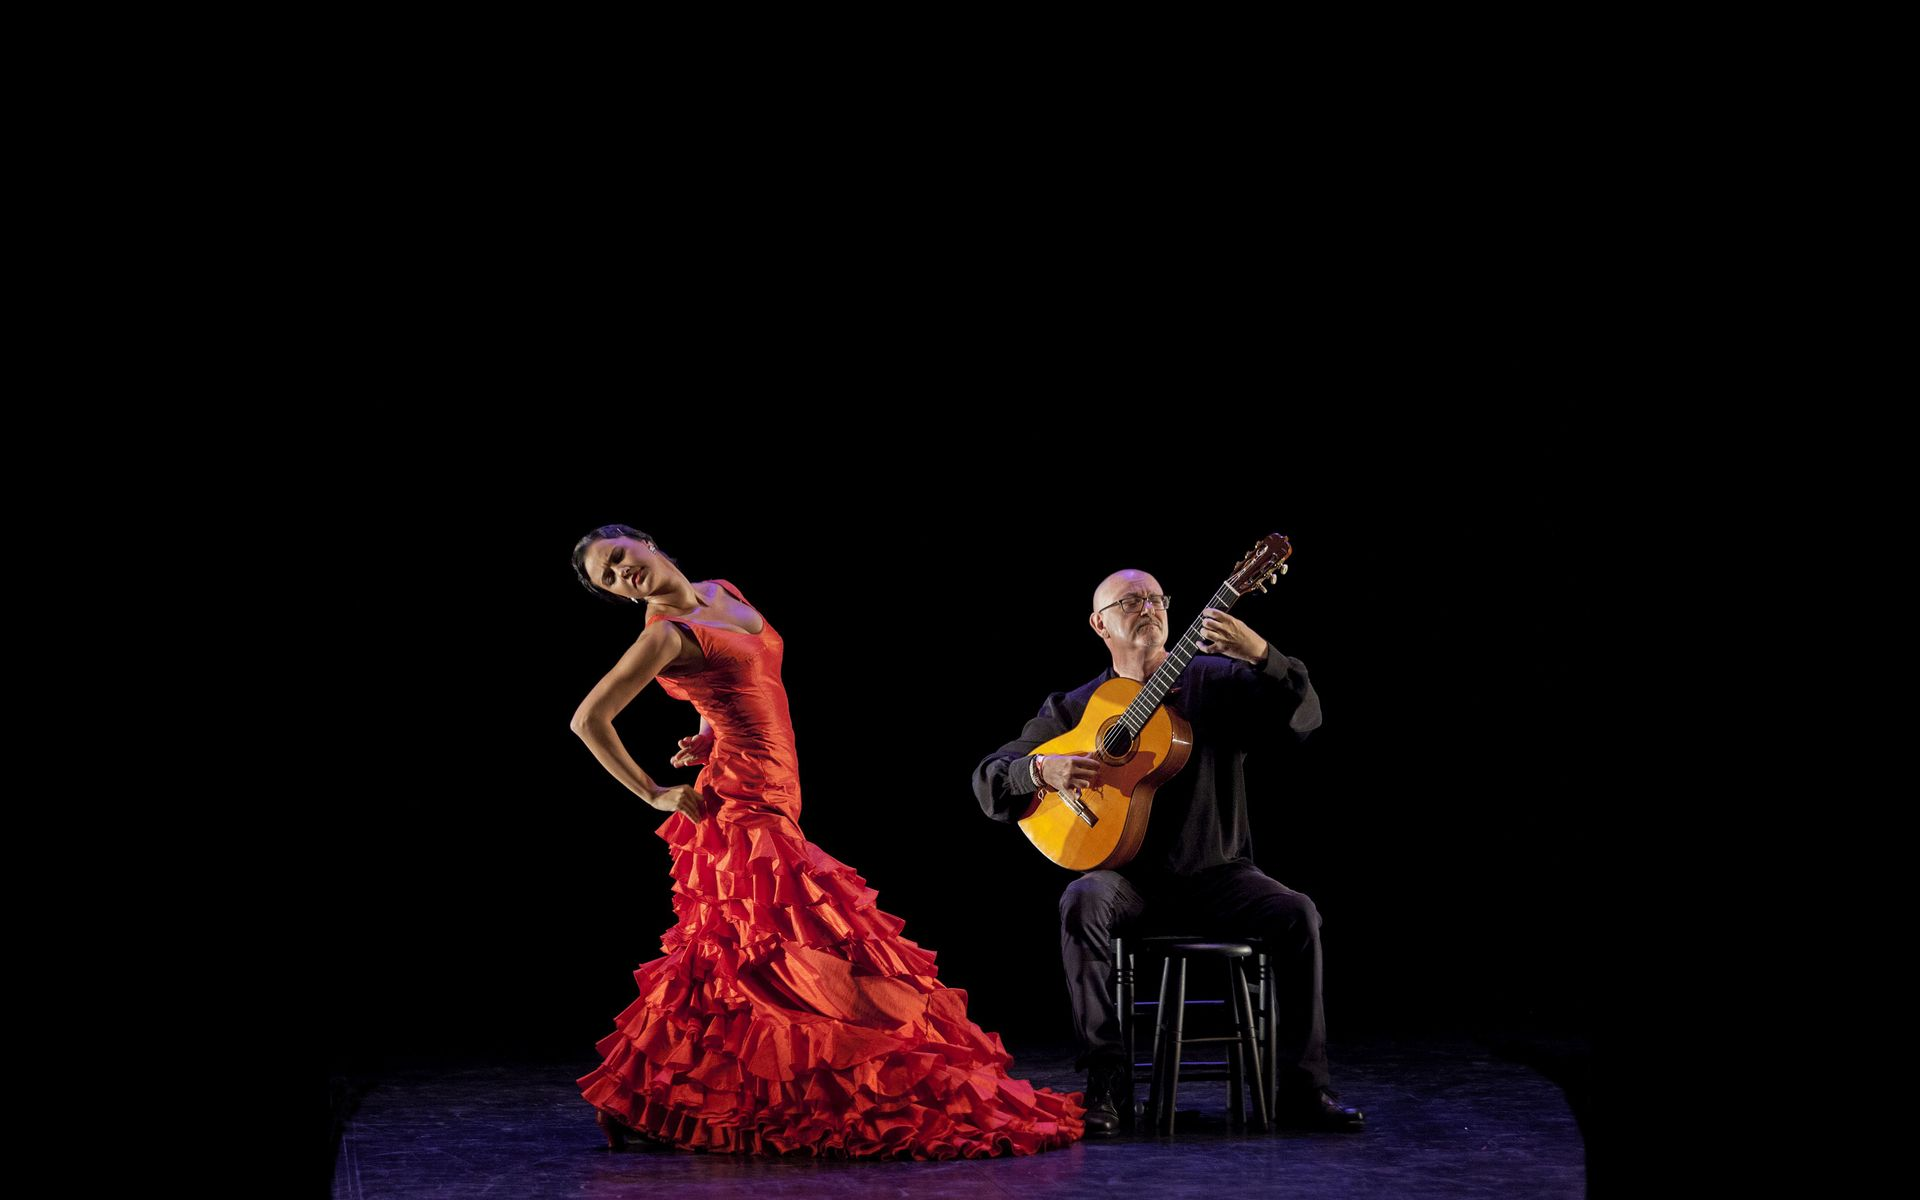 clases de baile flamenco madrid majadahonda